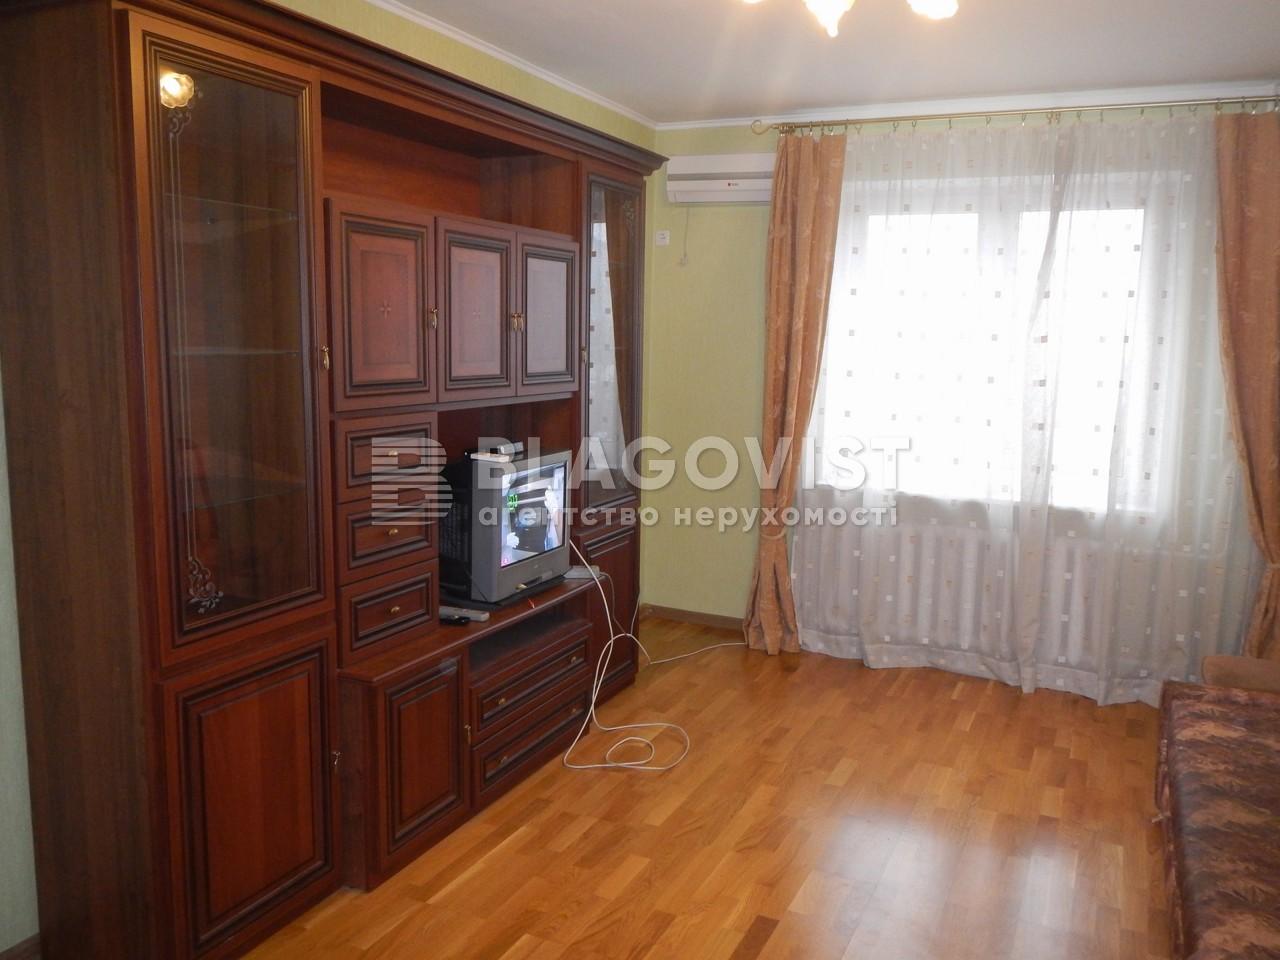 Квартира A-103098, Ващенка Григорія, 1, Київ - Фото 2